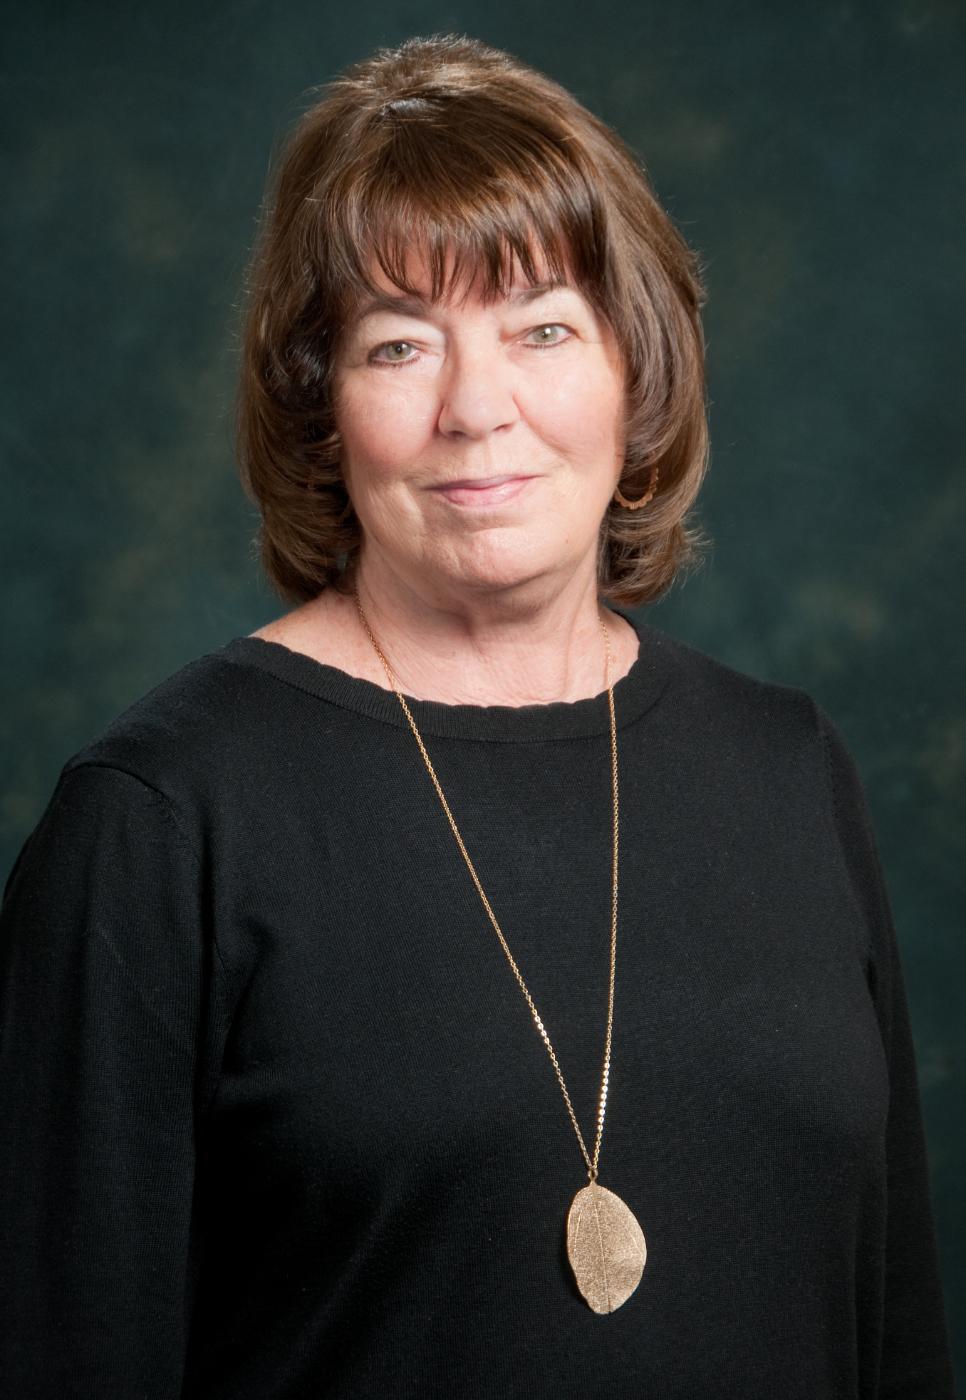 Geraldine-Headshot-Portrait-.jpg